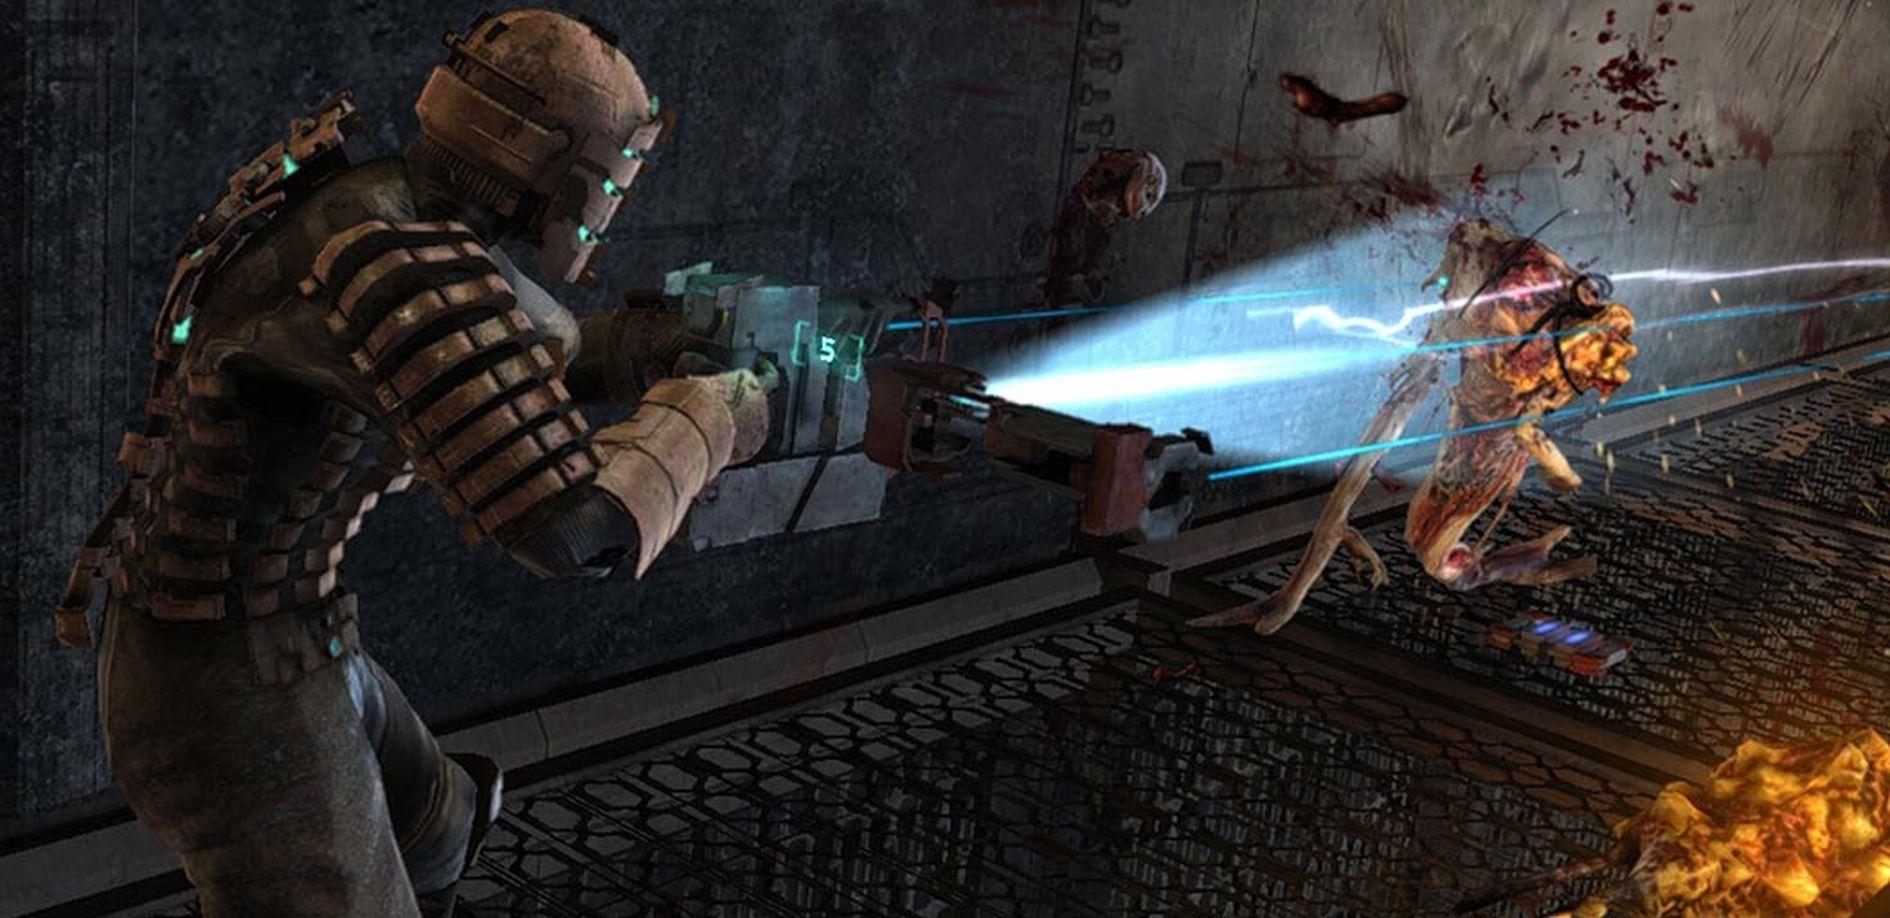 Fachgerechtes Feind-Filetieren in Dead Space.